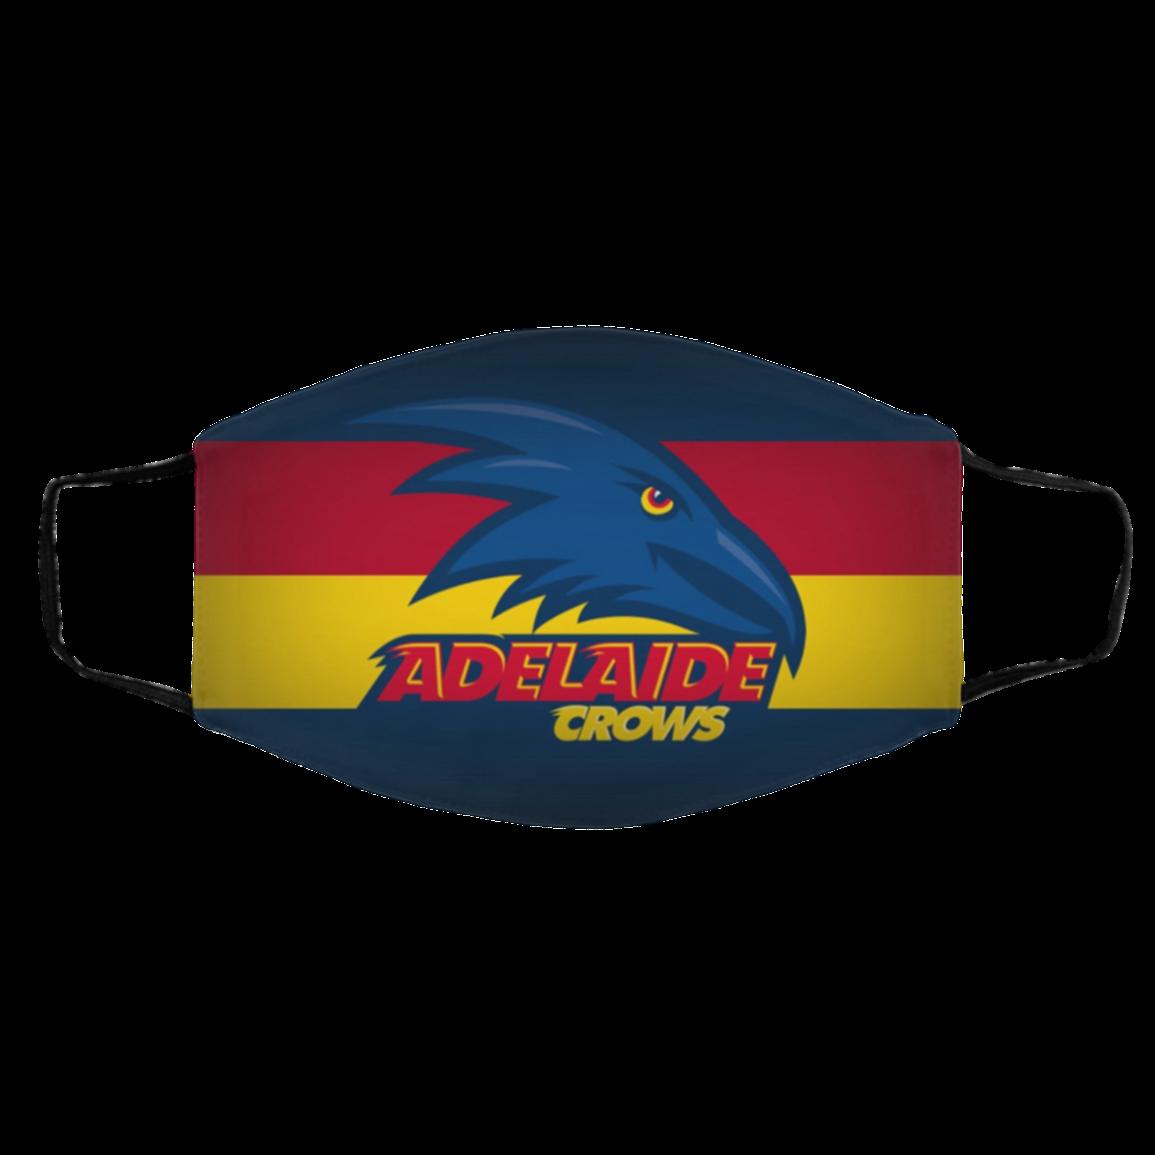 Ad-elaid-e Crows A-ust-ralian National Flag Zipped Design Face Mask